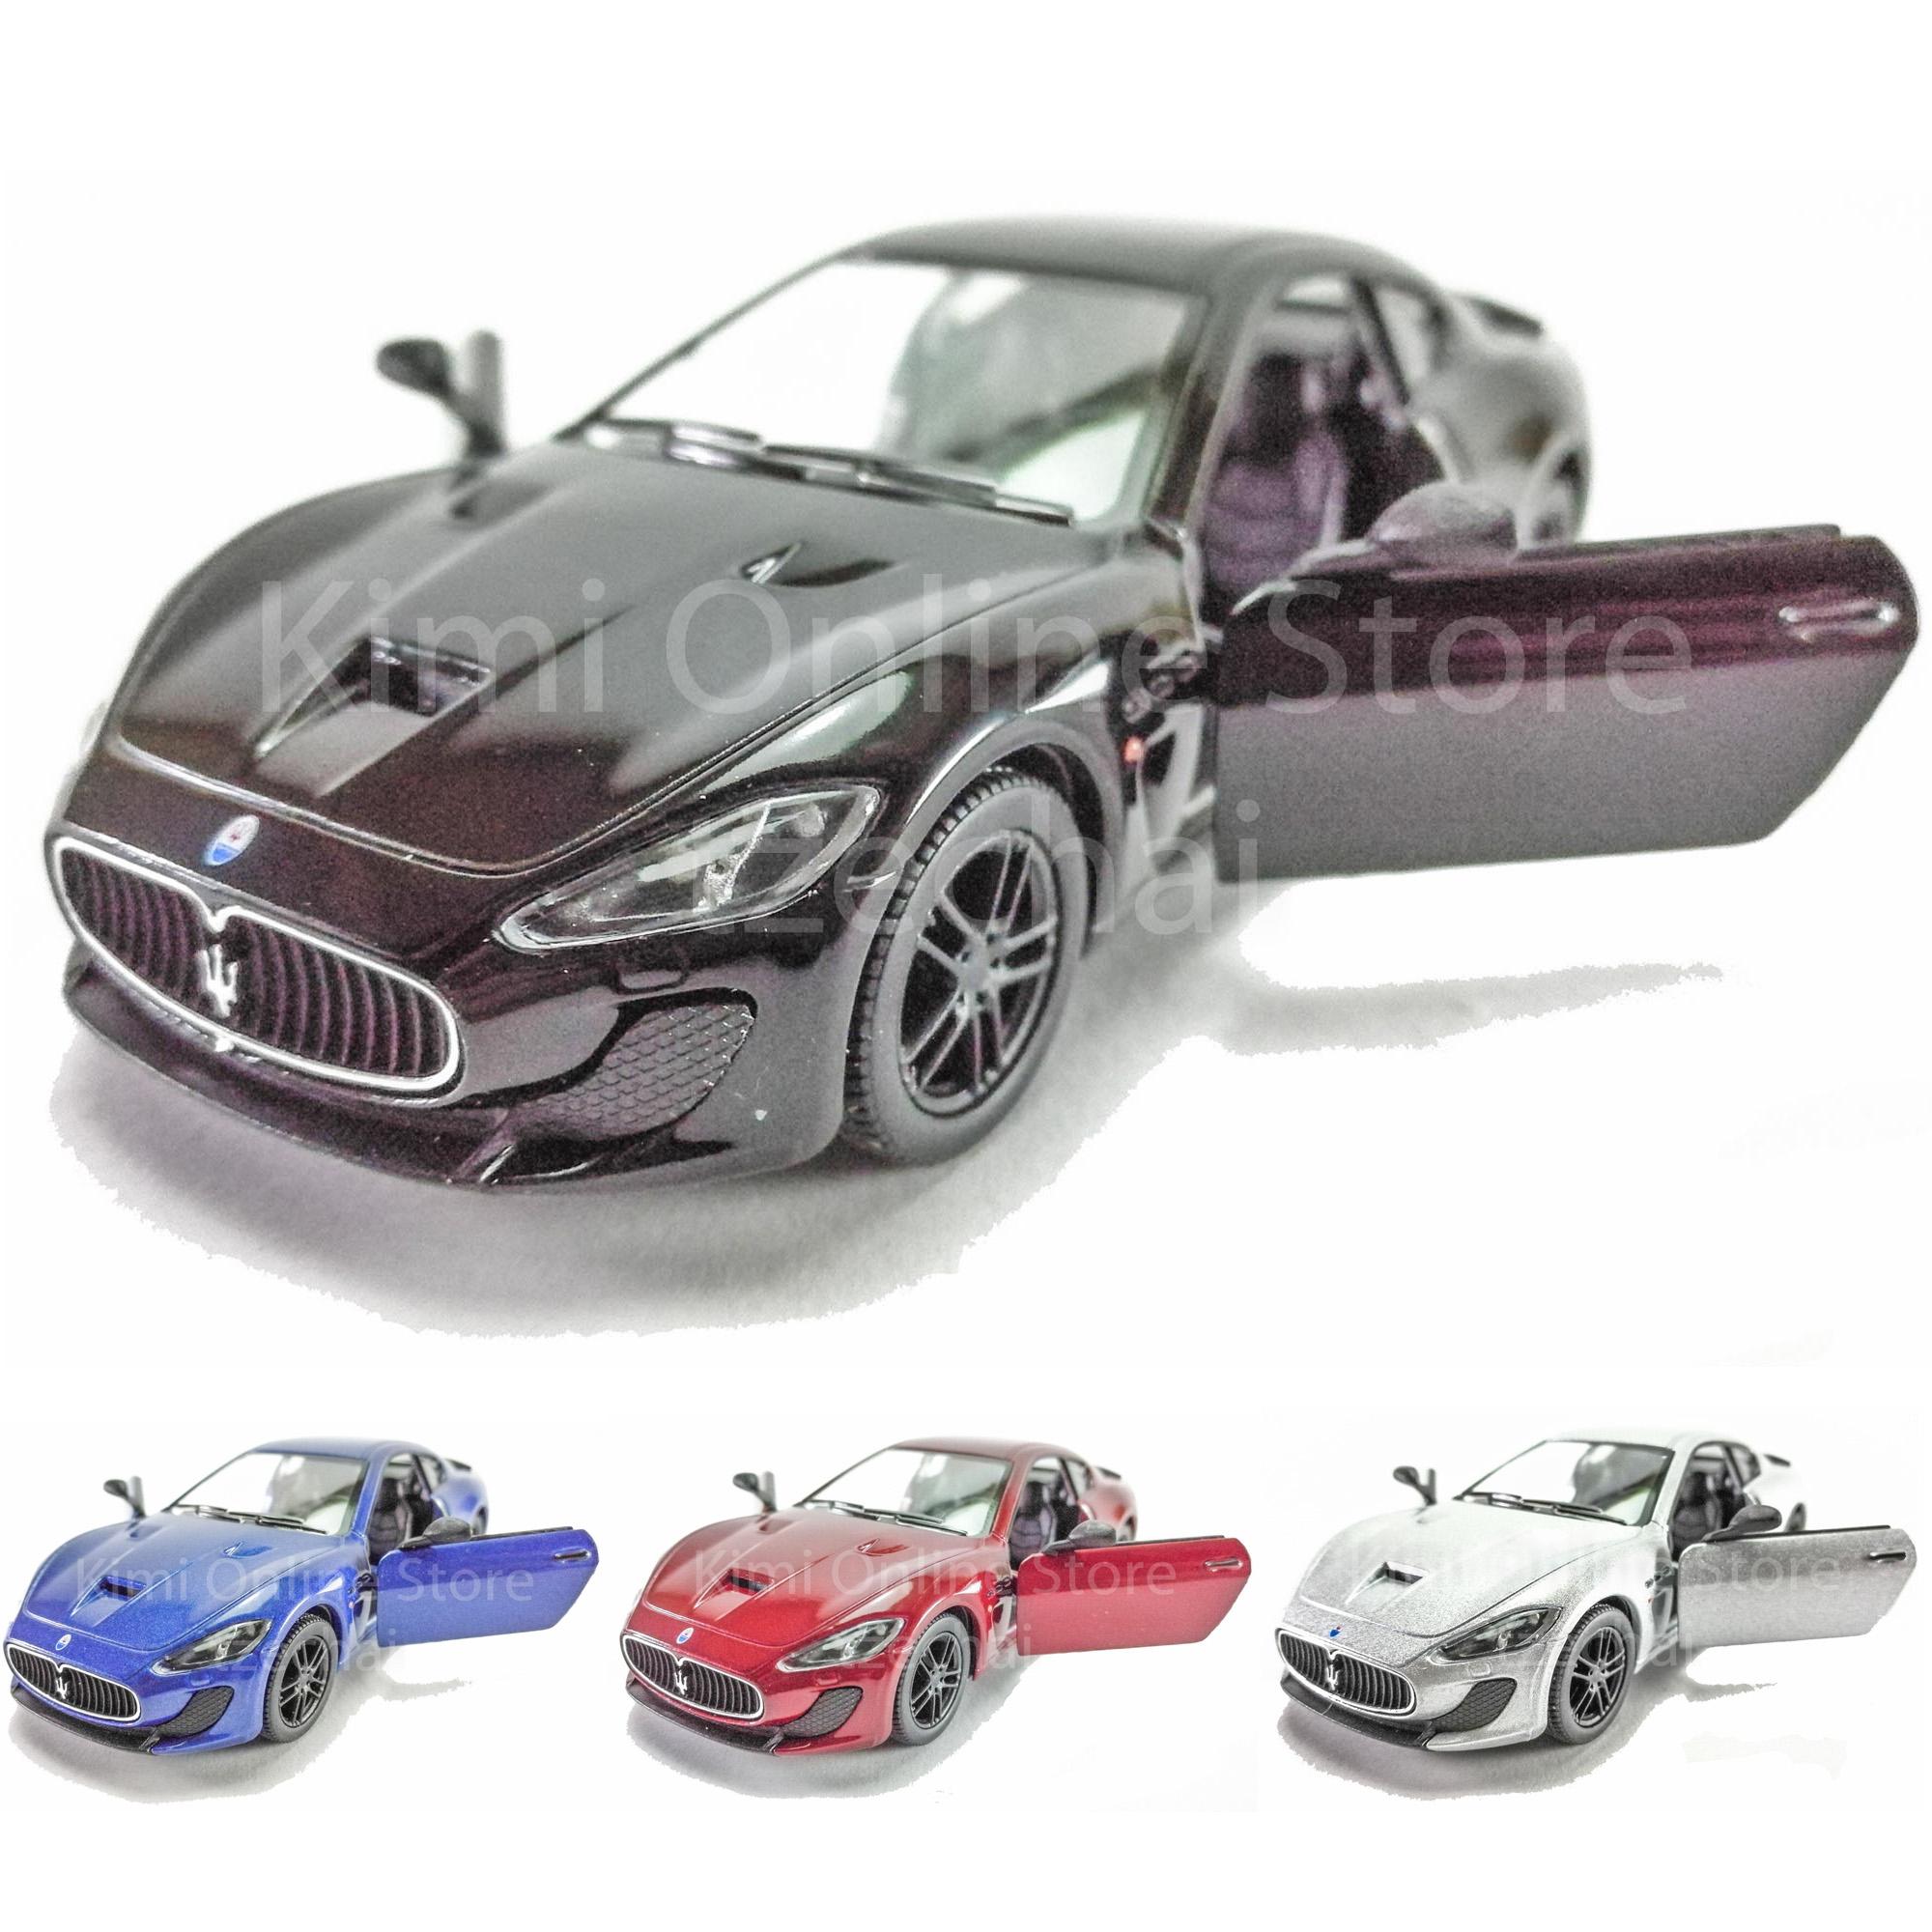 Kinsmart Diecast Car 1:38 Maserati GranTurismo MC Stradale Red Blue Black  Silv. U2039 U203a